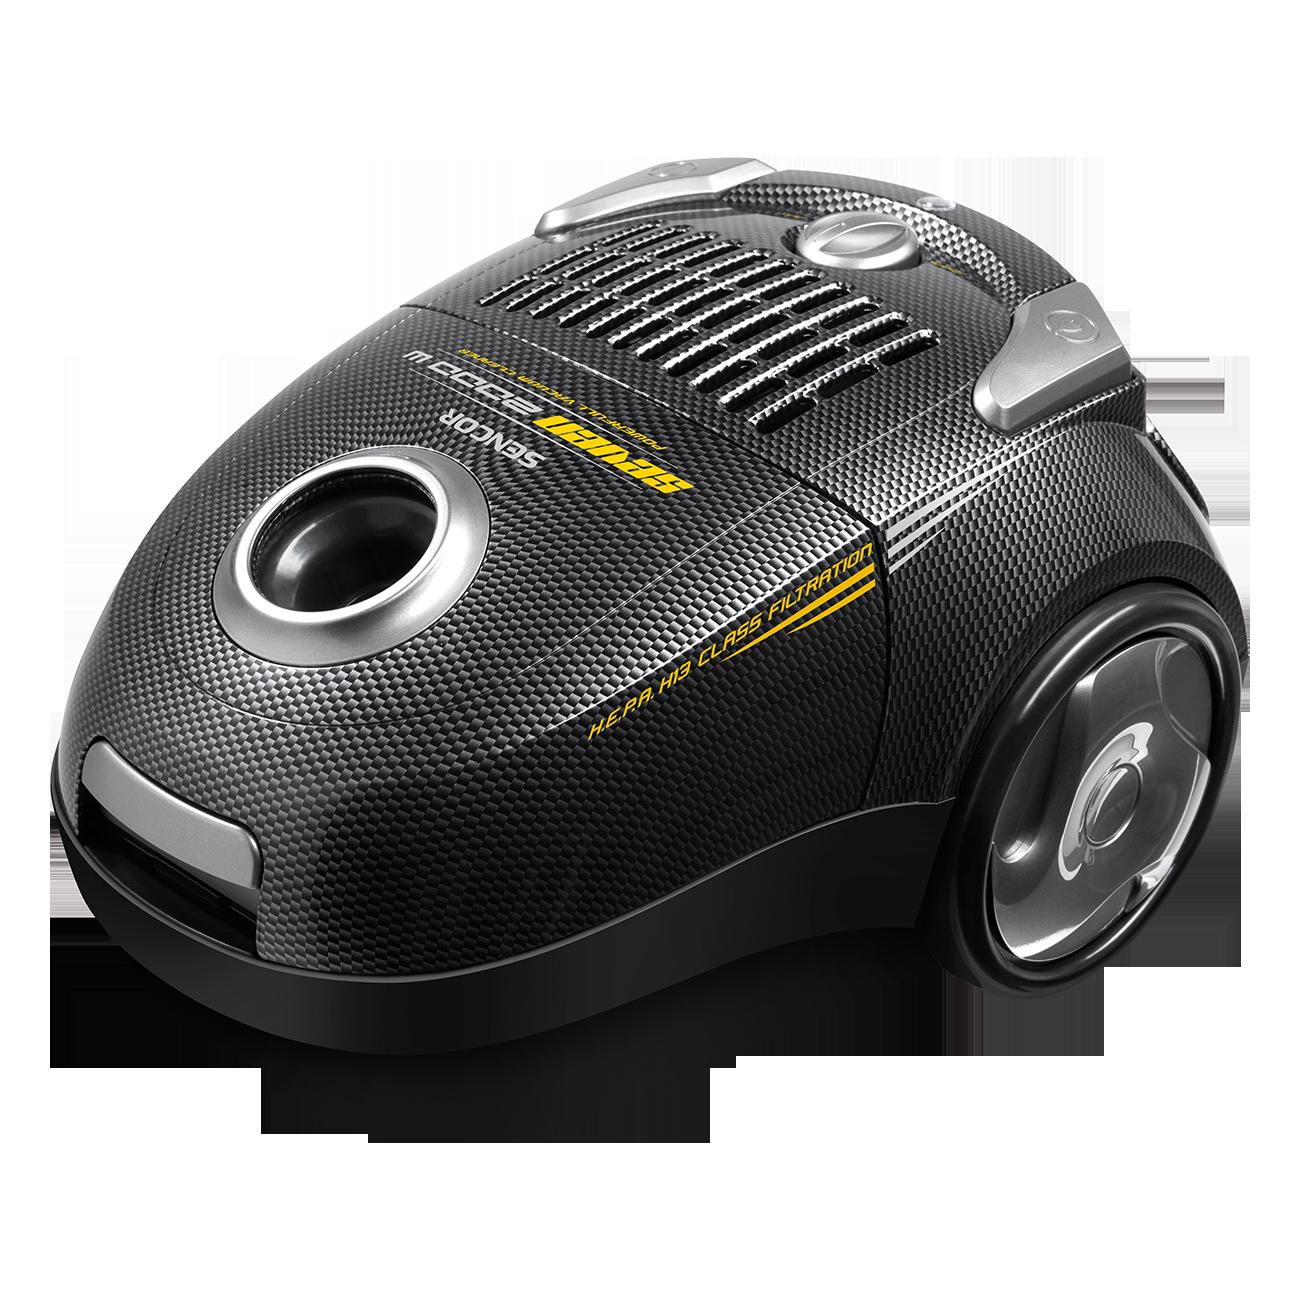 Пылесос Sencor Real Brand Technics 4799.000